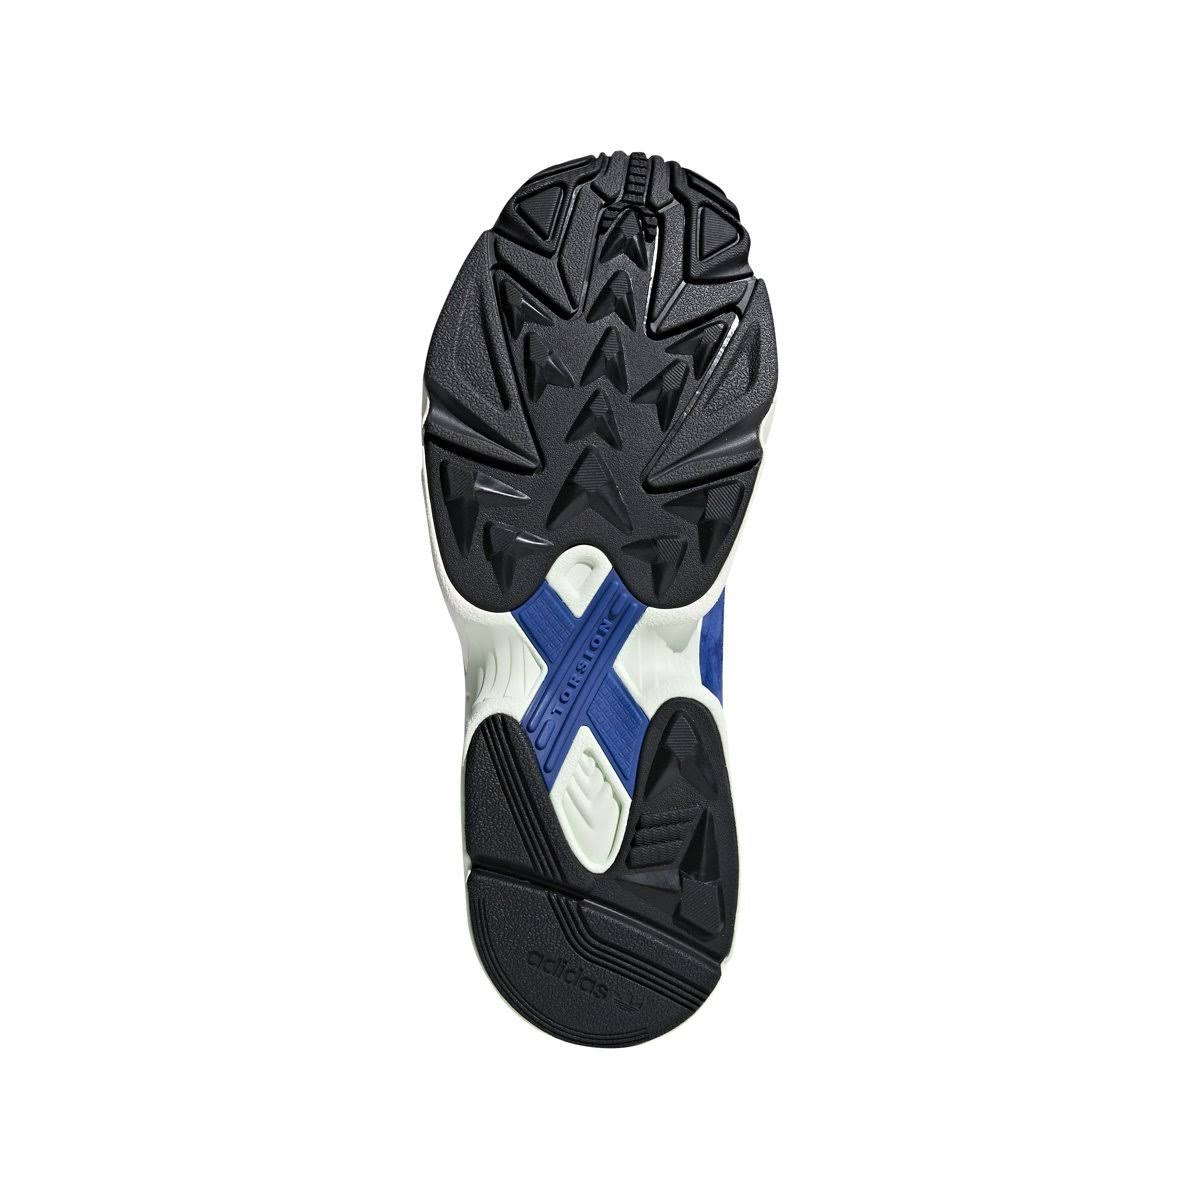 13 Adidas Hombre Yung Gris M Para 1 Tamaño Zapatillas c0ZFwydqn0